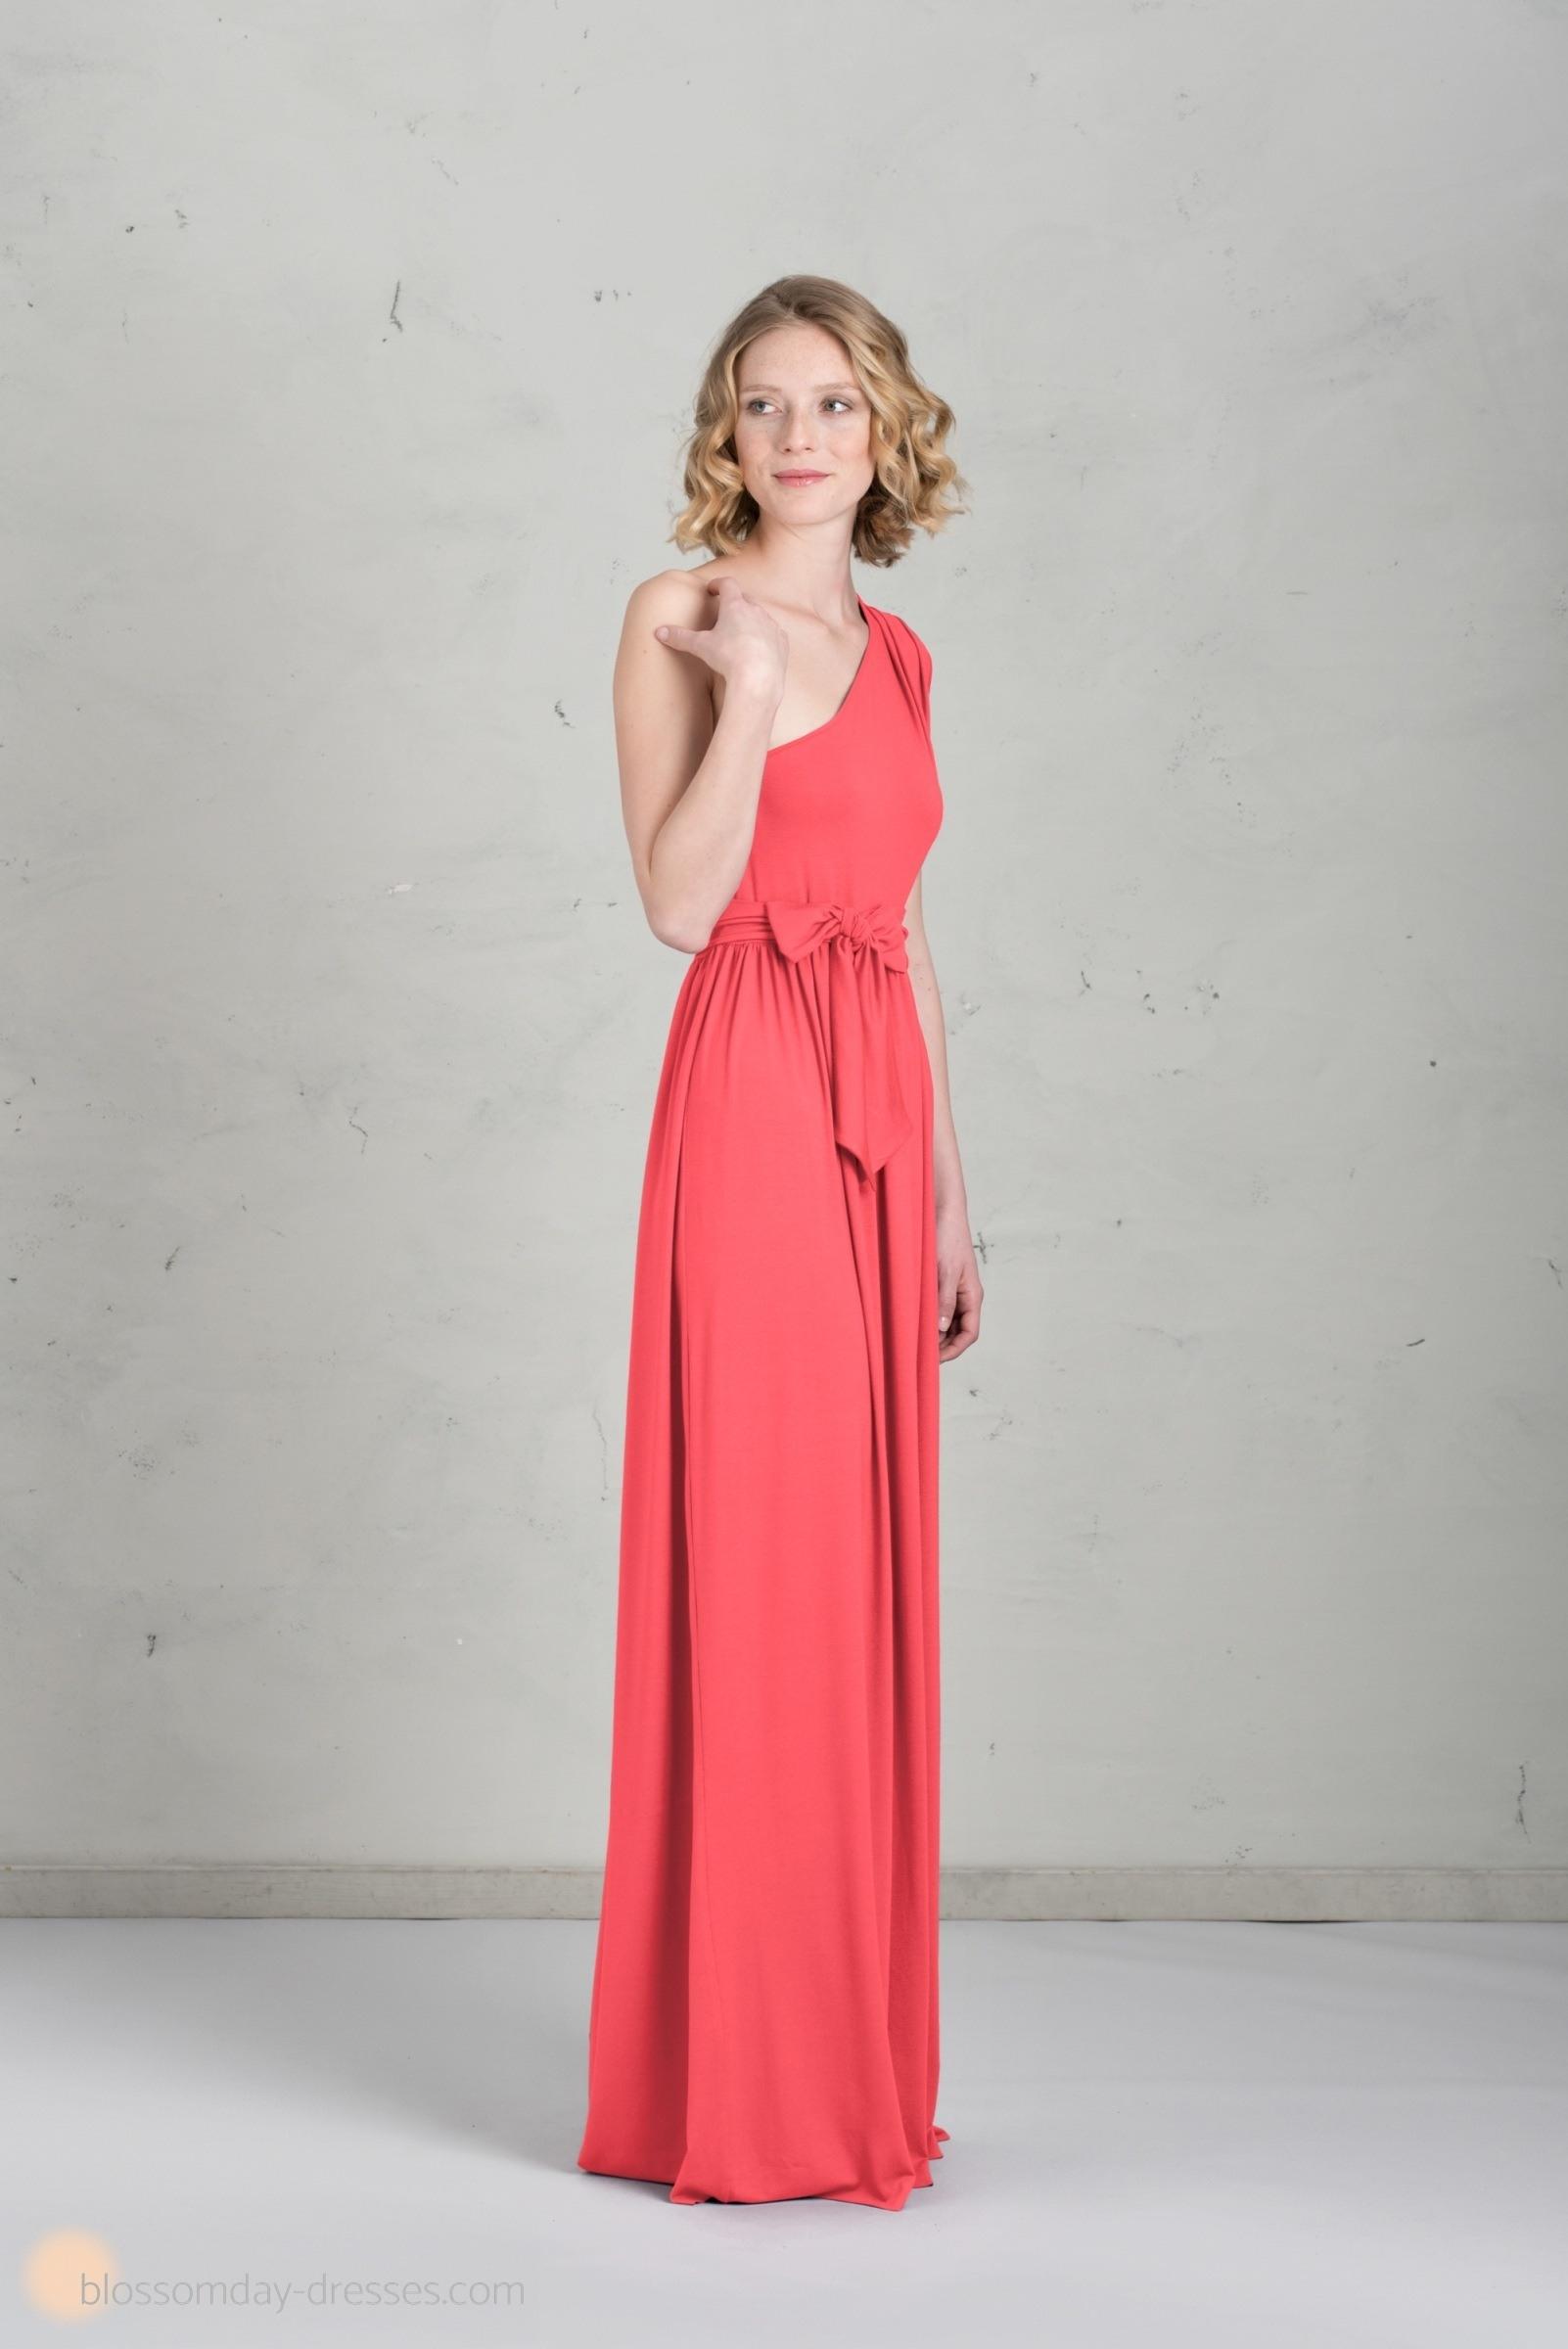 17 Cool Langes Kleid Koralle SpezialgebietDesigner Ausgezeichnet Langes Kleid Koralle Ärmel